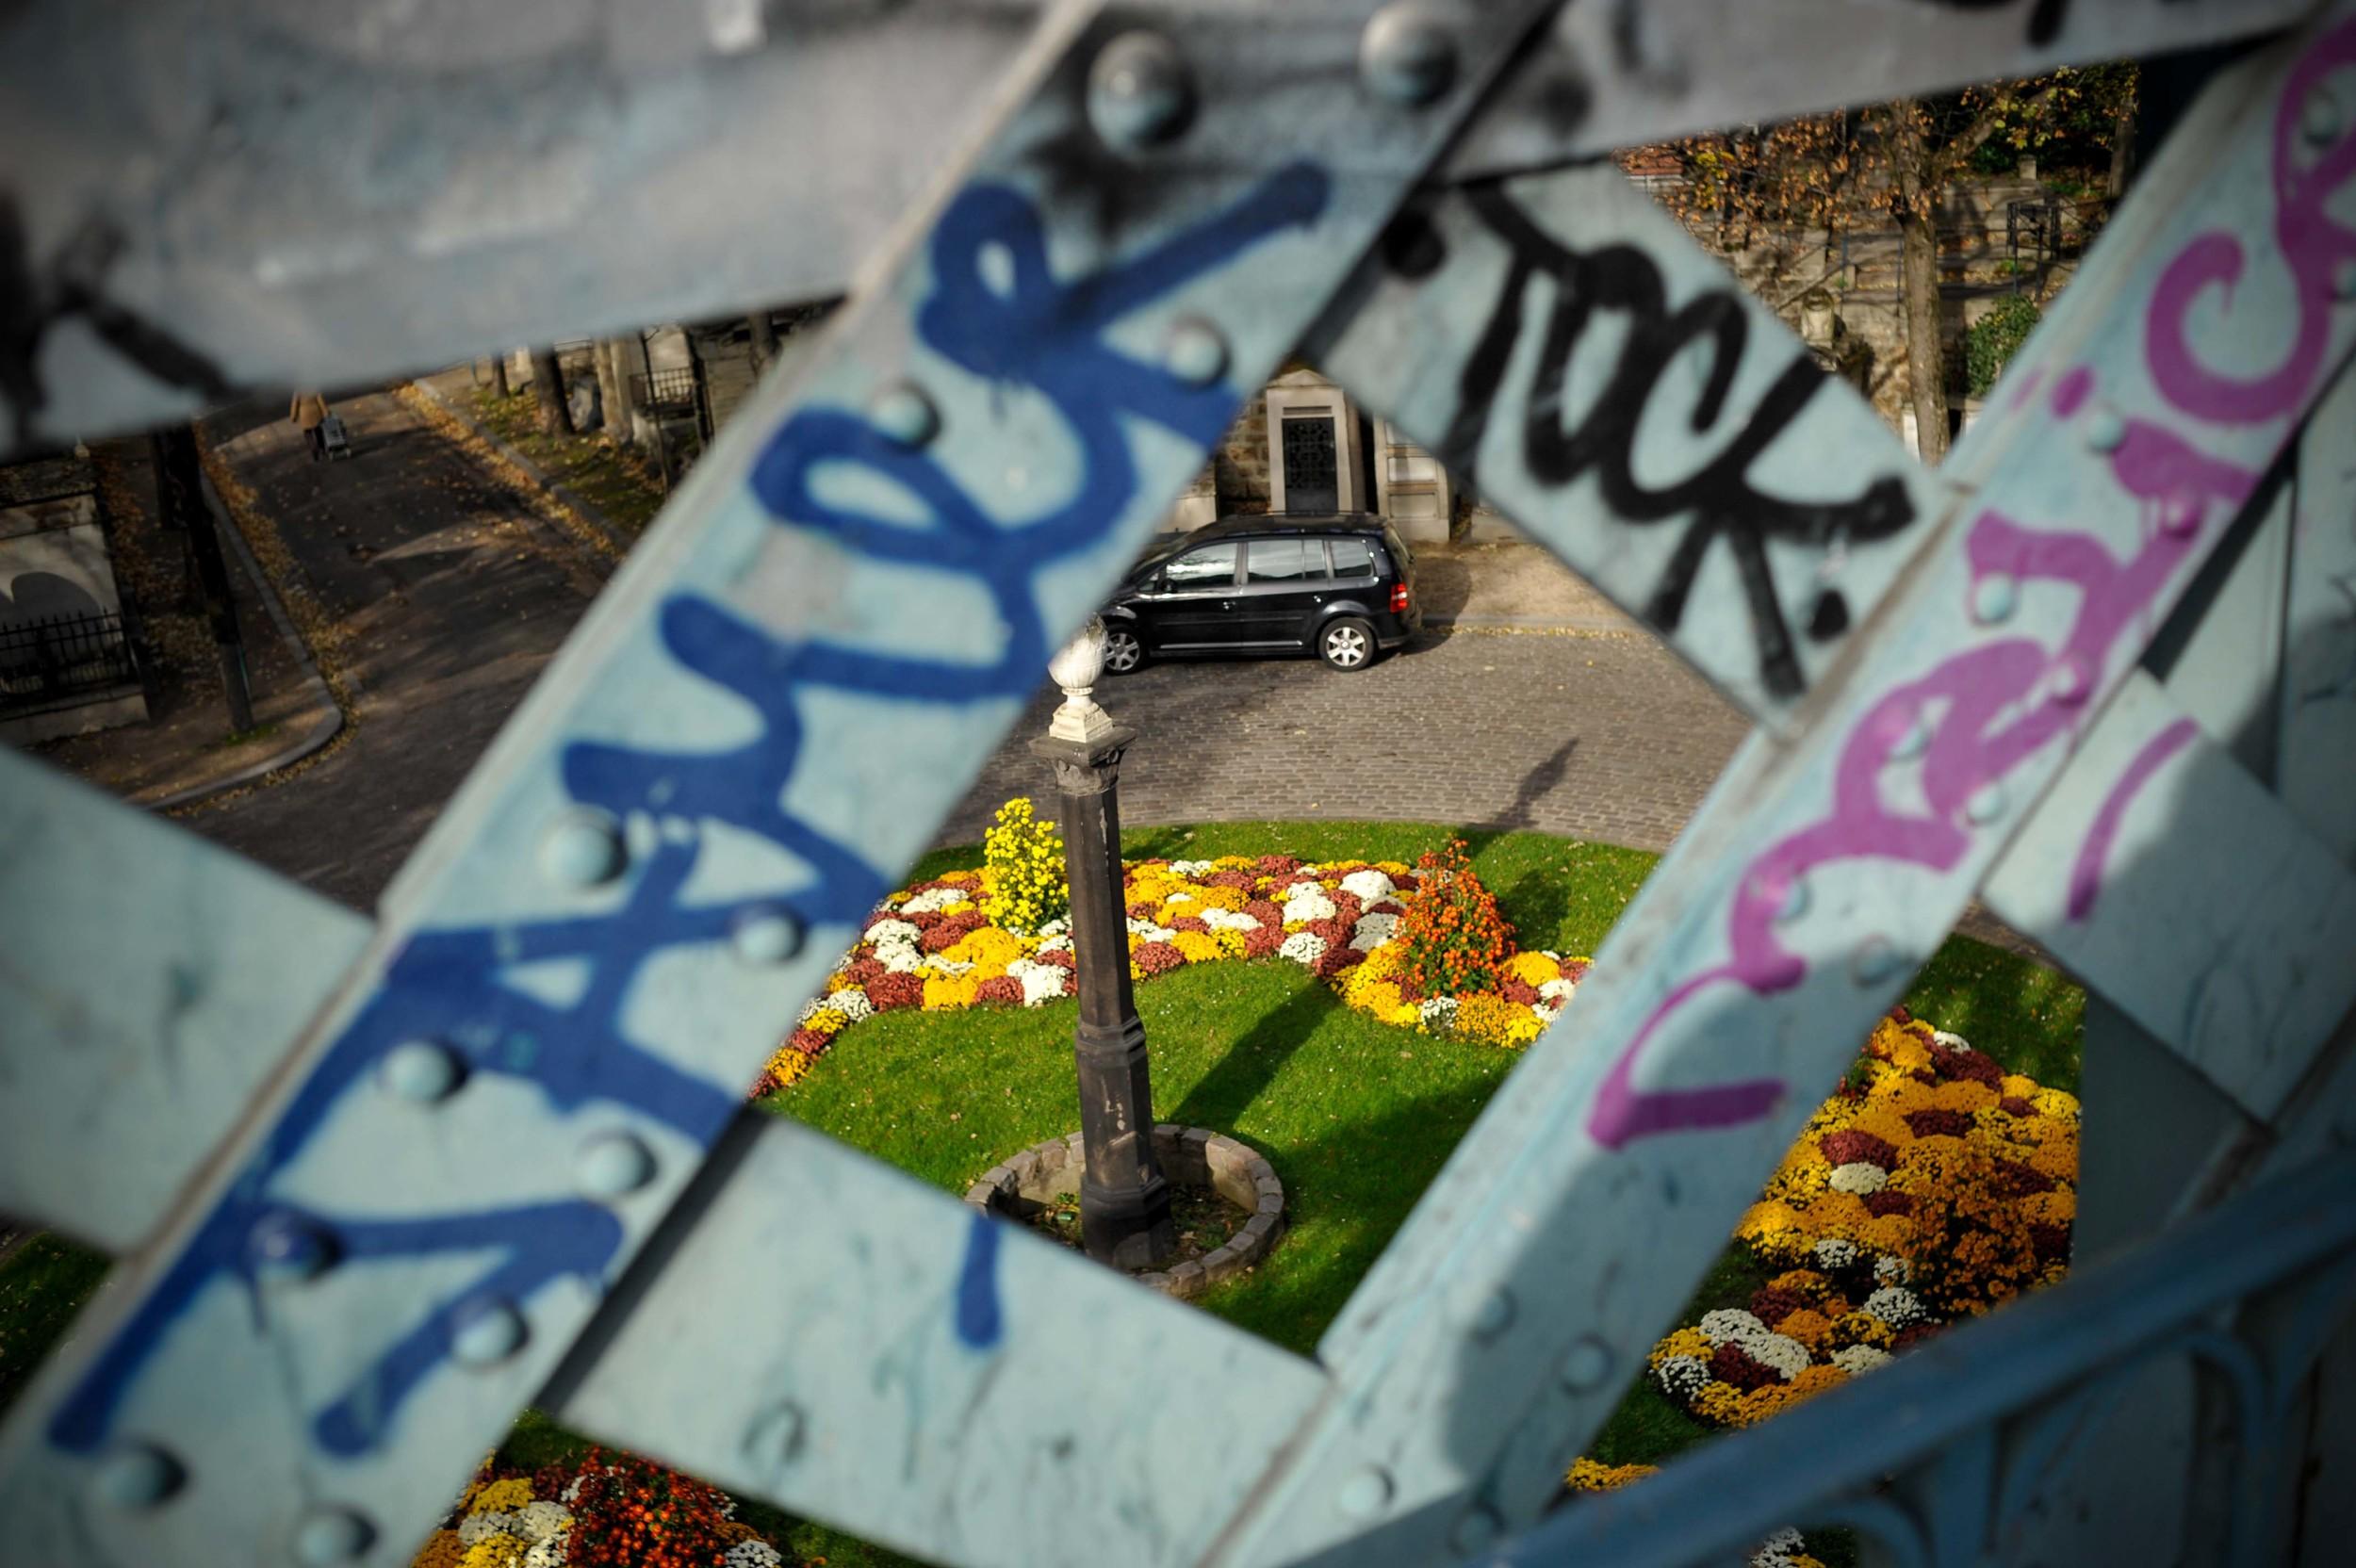 Paris_web_2014-10.jpg